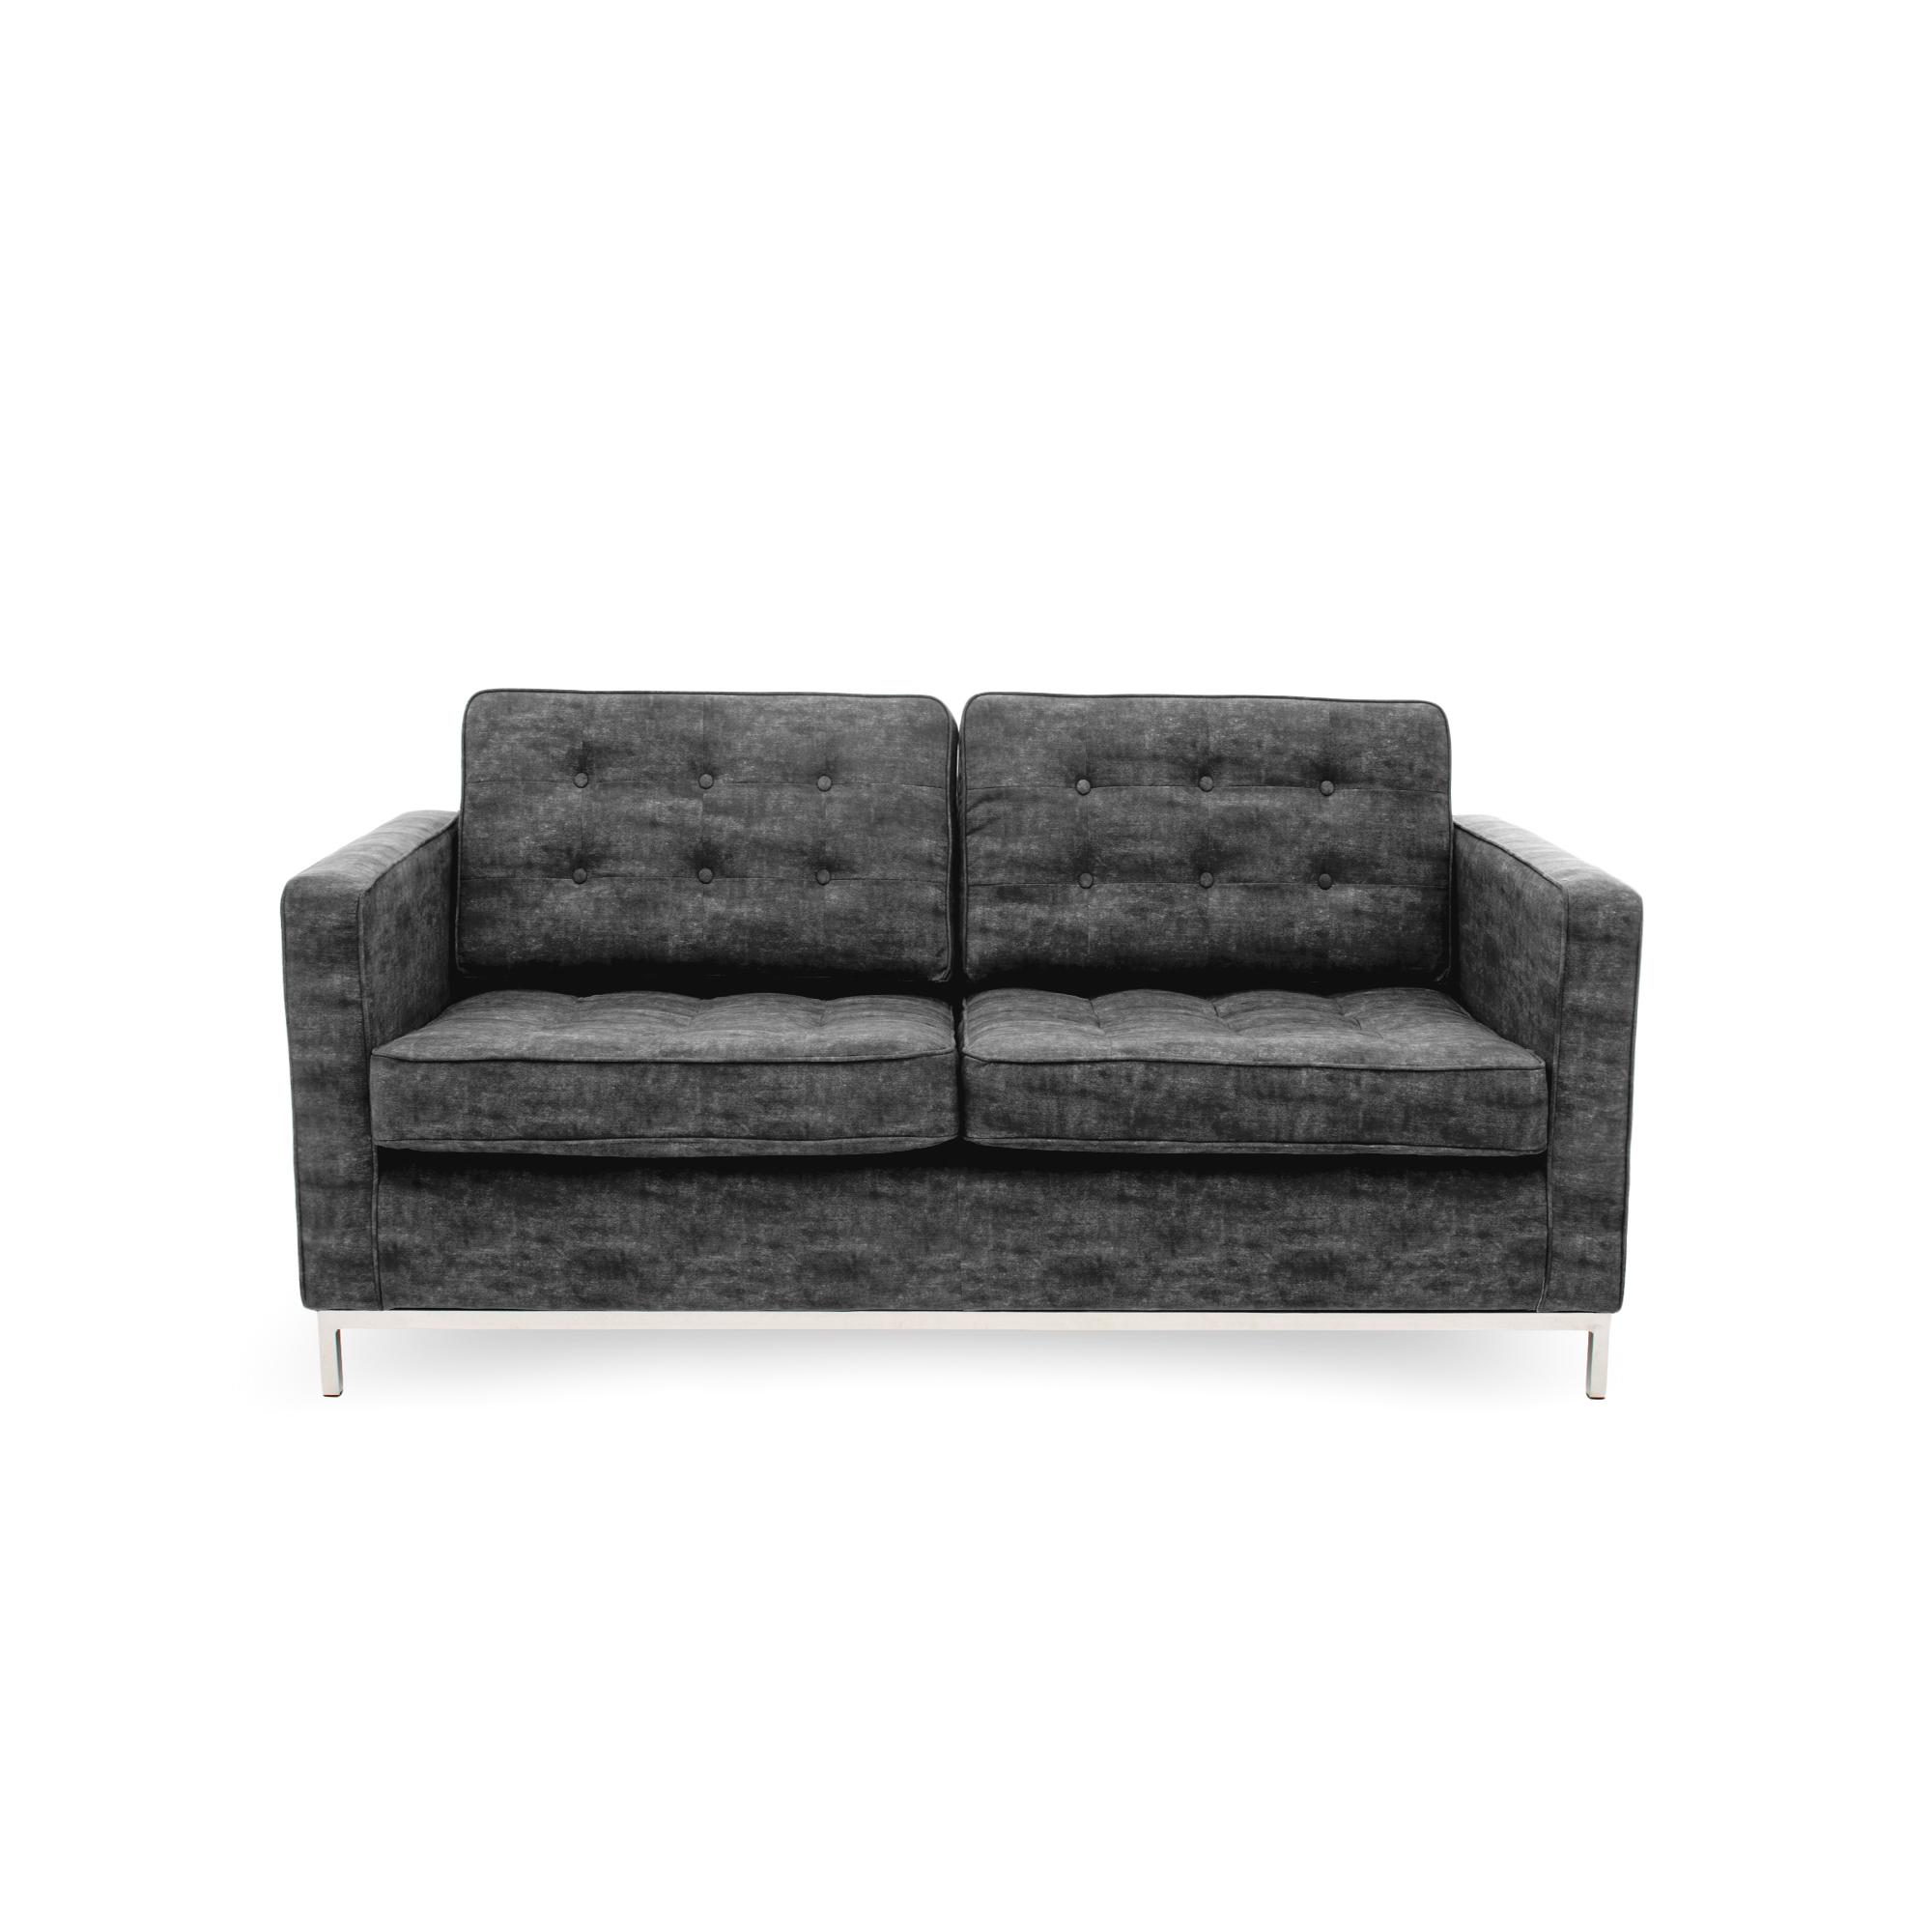 Canapea Fixa 2 locuri Ben Dark Grey